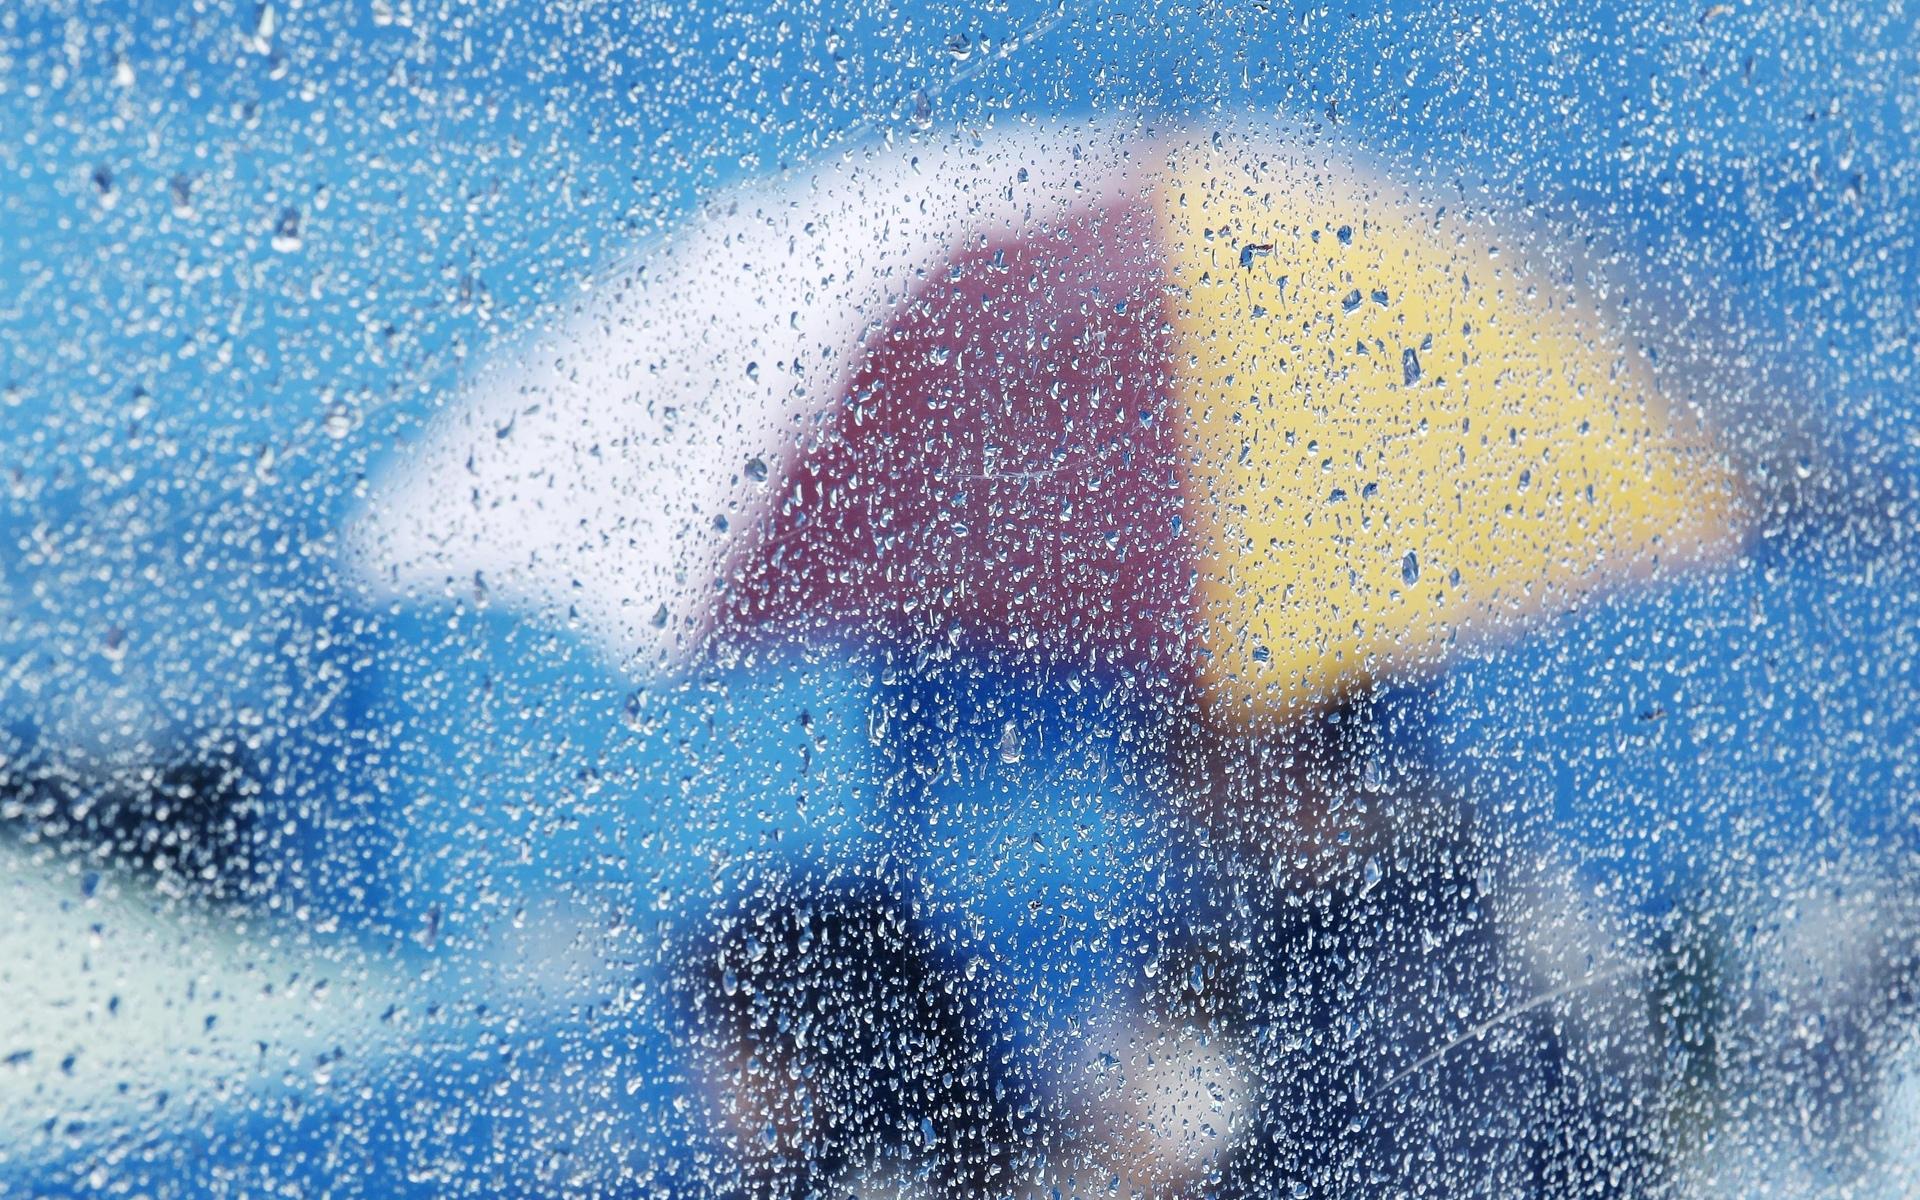 Rain Full Hd Wallpaper And Background 1920x1200 Id 311248